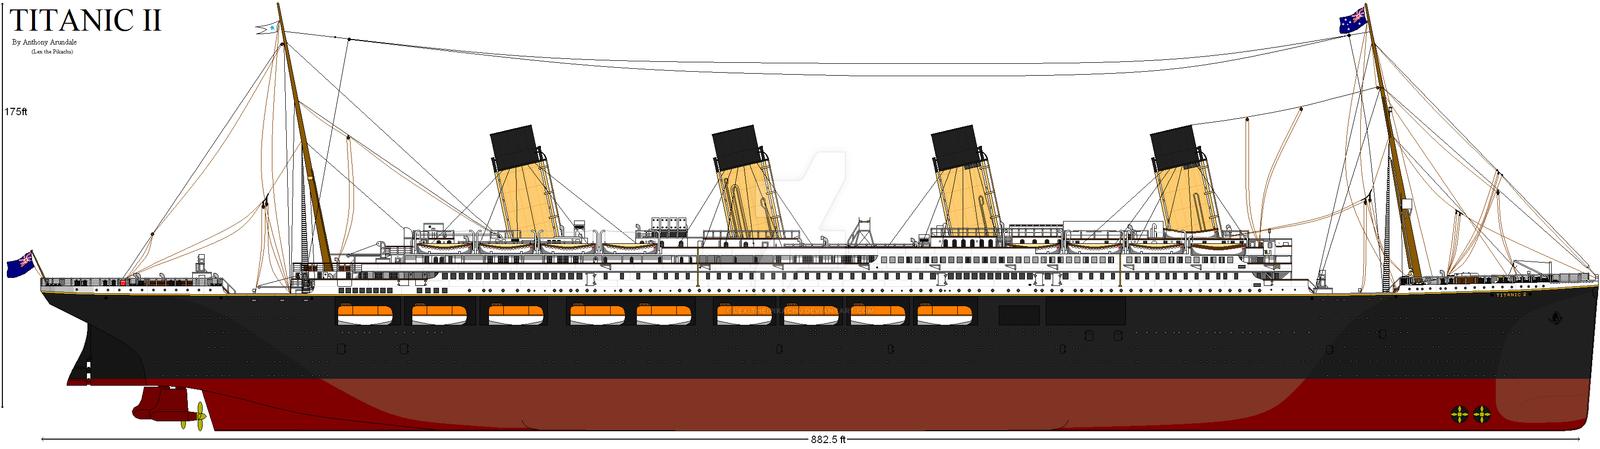 Titanic II By Fallout Brony On DeviantArt